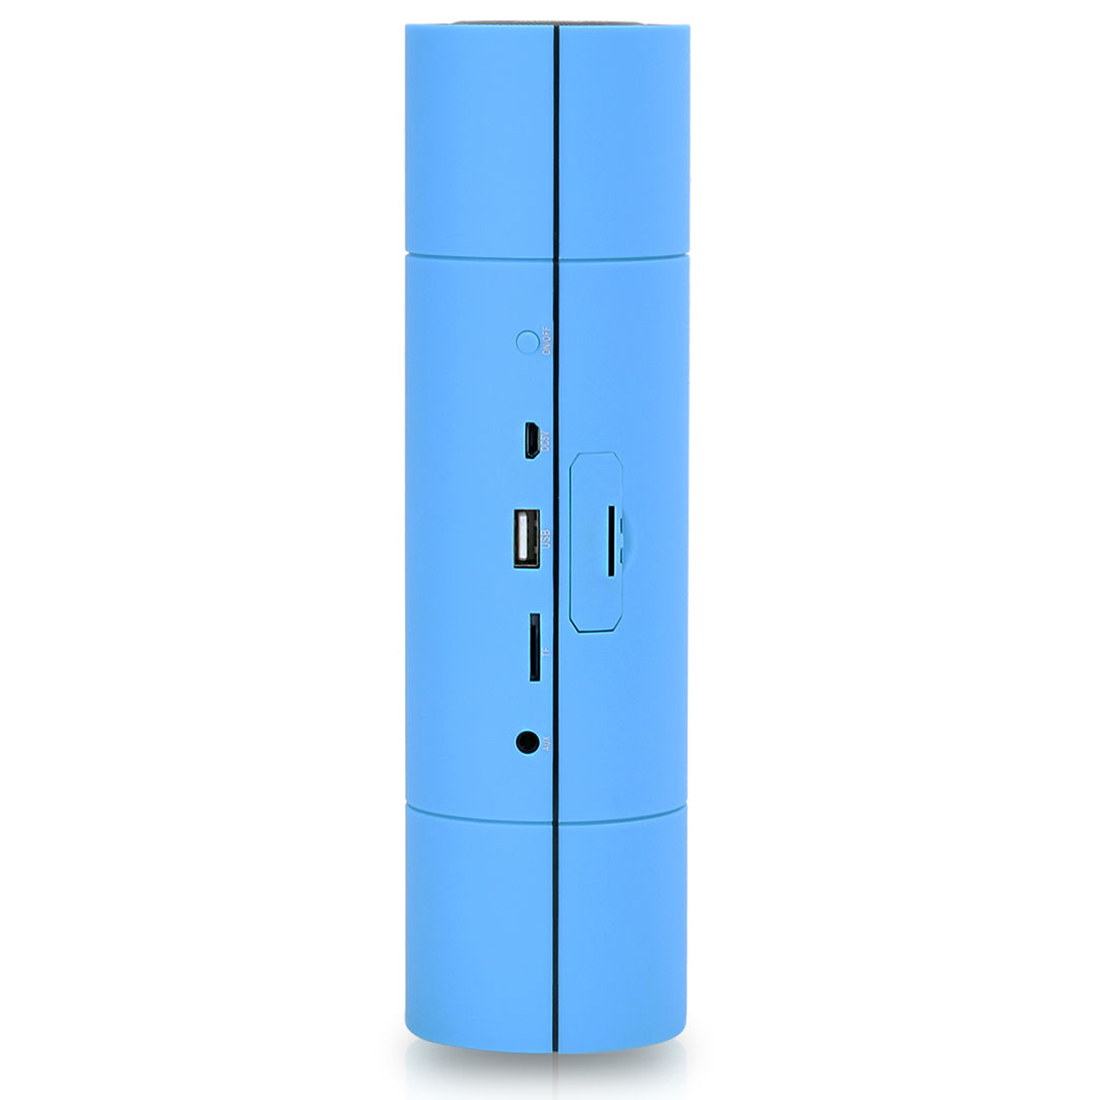 Multi Portable LCD Speaker Wireless Bluetooth V3.0 NFC Speaker With FM Radio